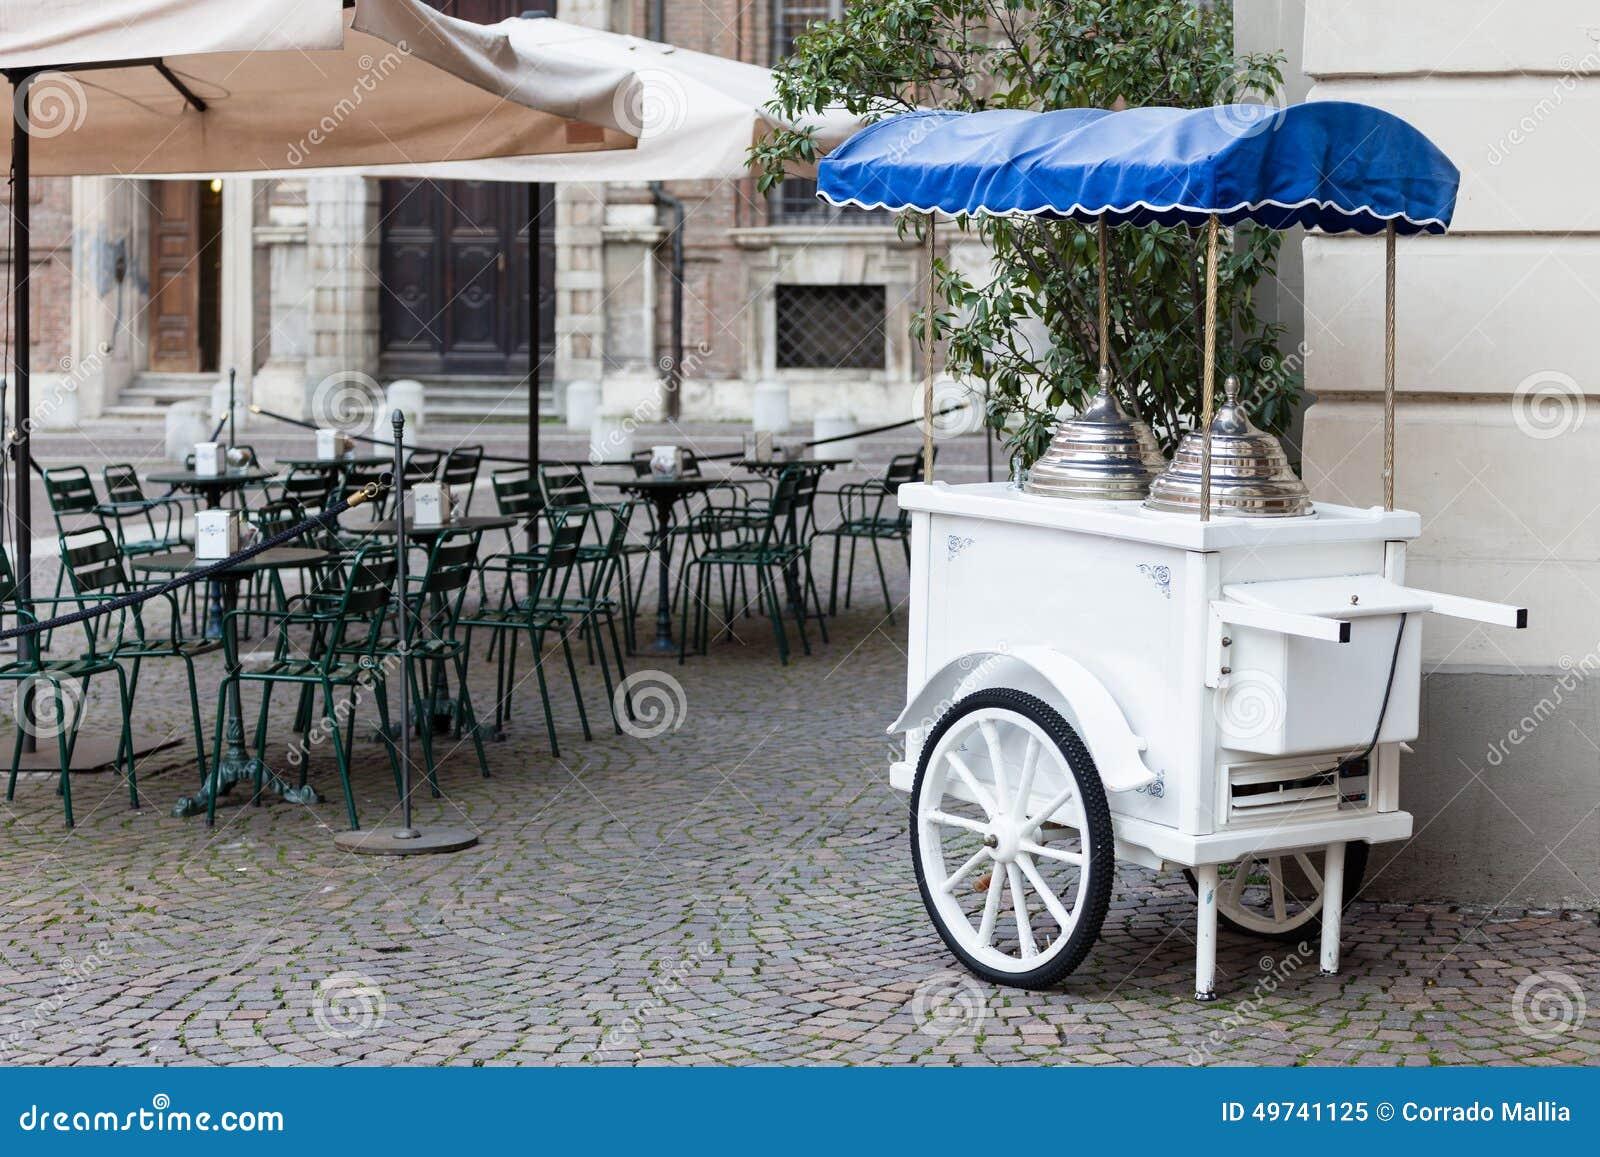 Vintage Ice Cream Cart Stock Photo - Image: 49741125 Vintage Ice Cream ...